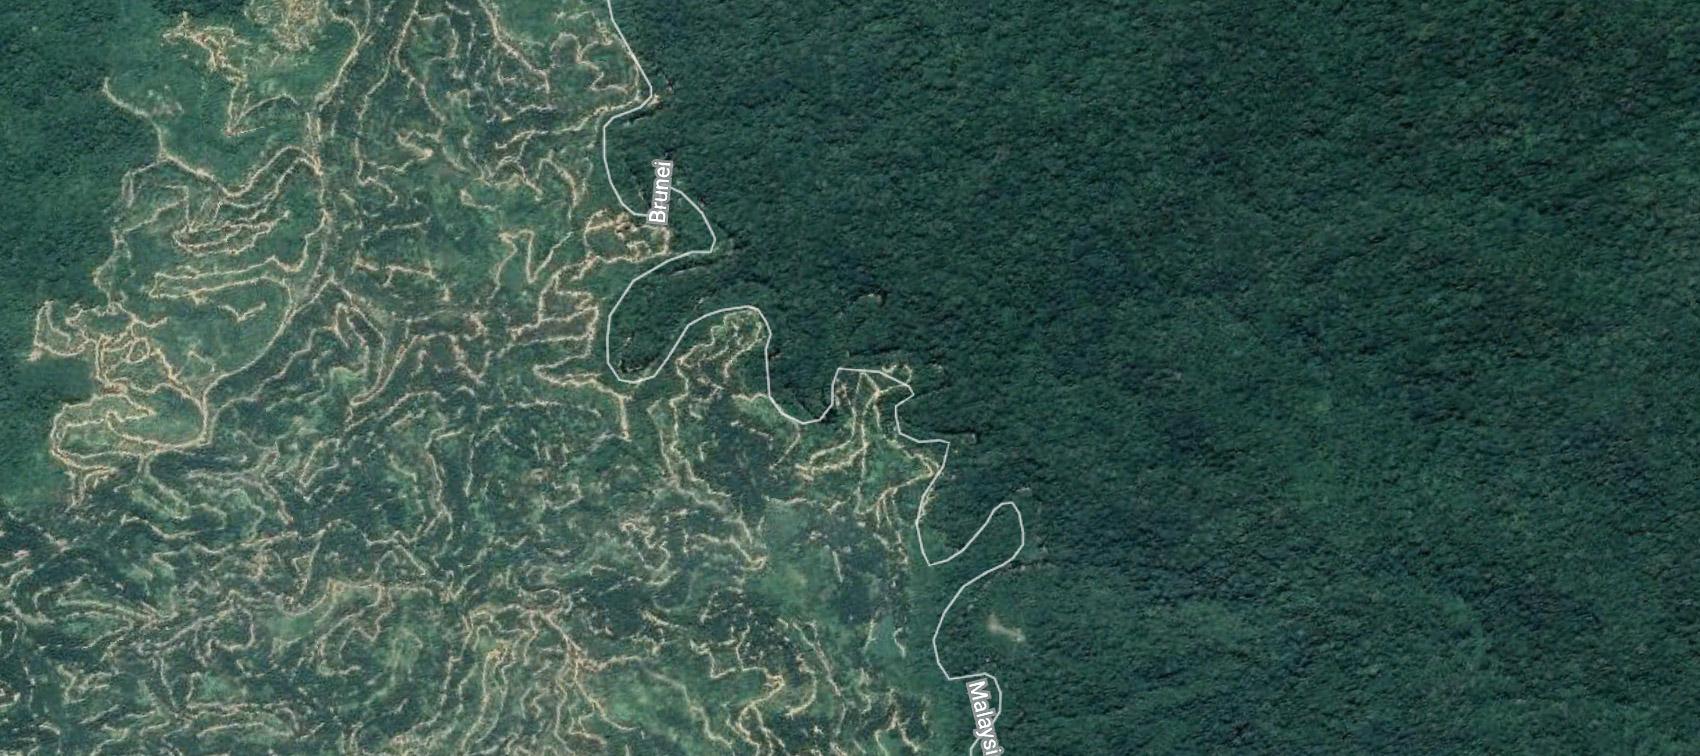 Ulu Temburong Google Earth 2.jpg